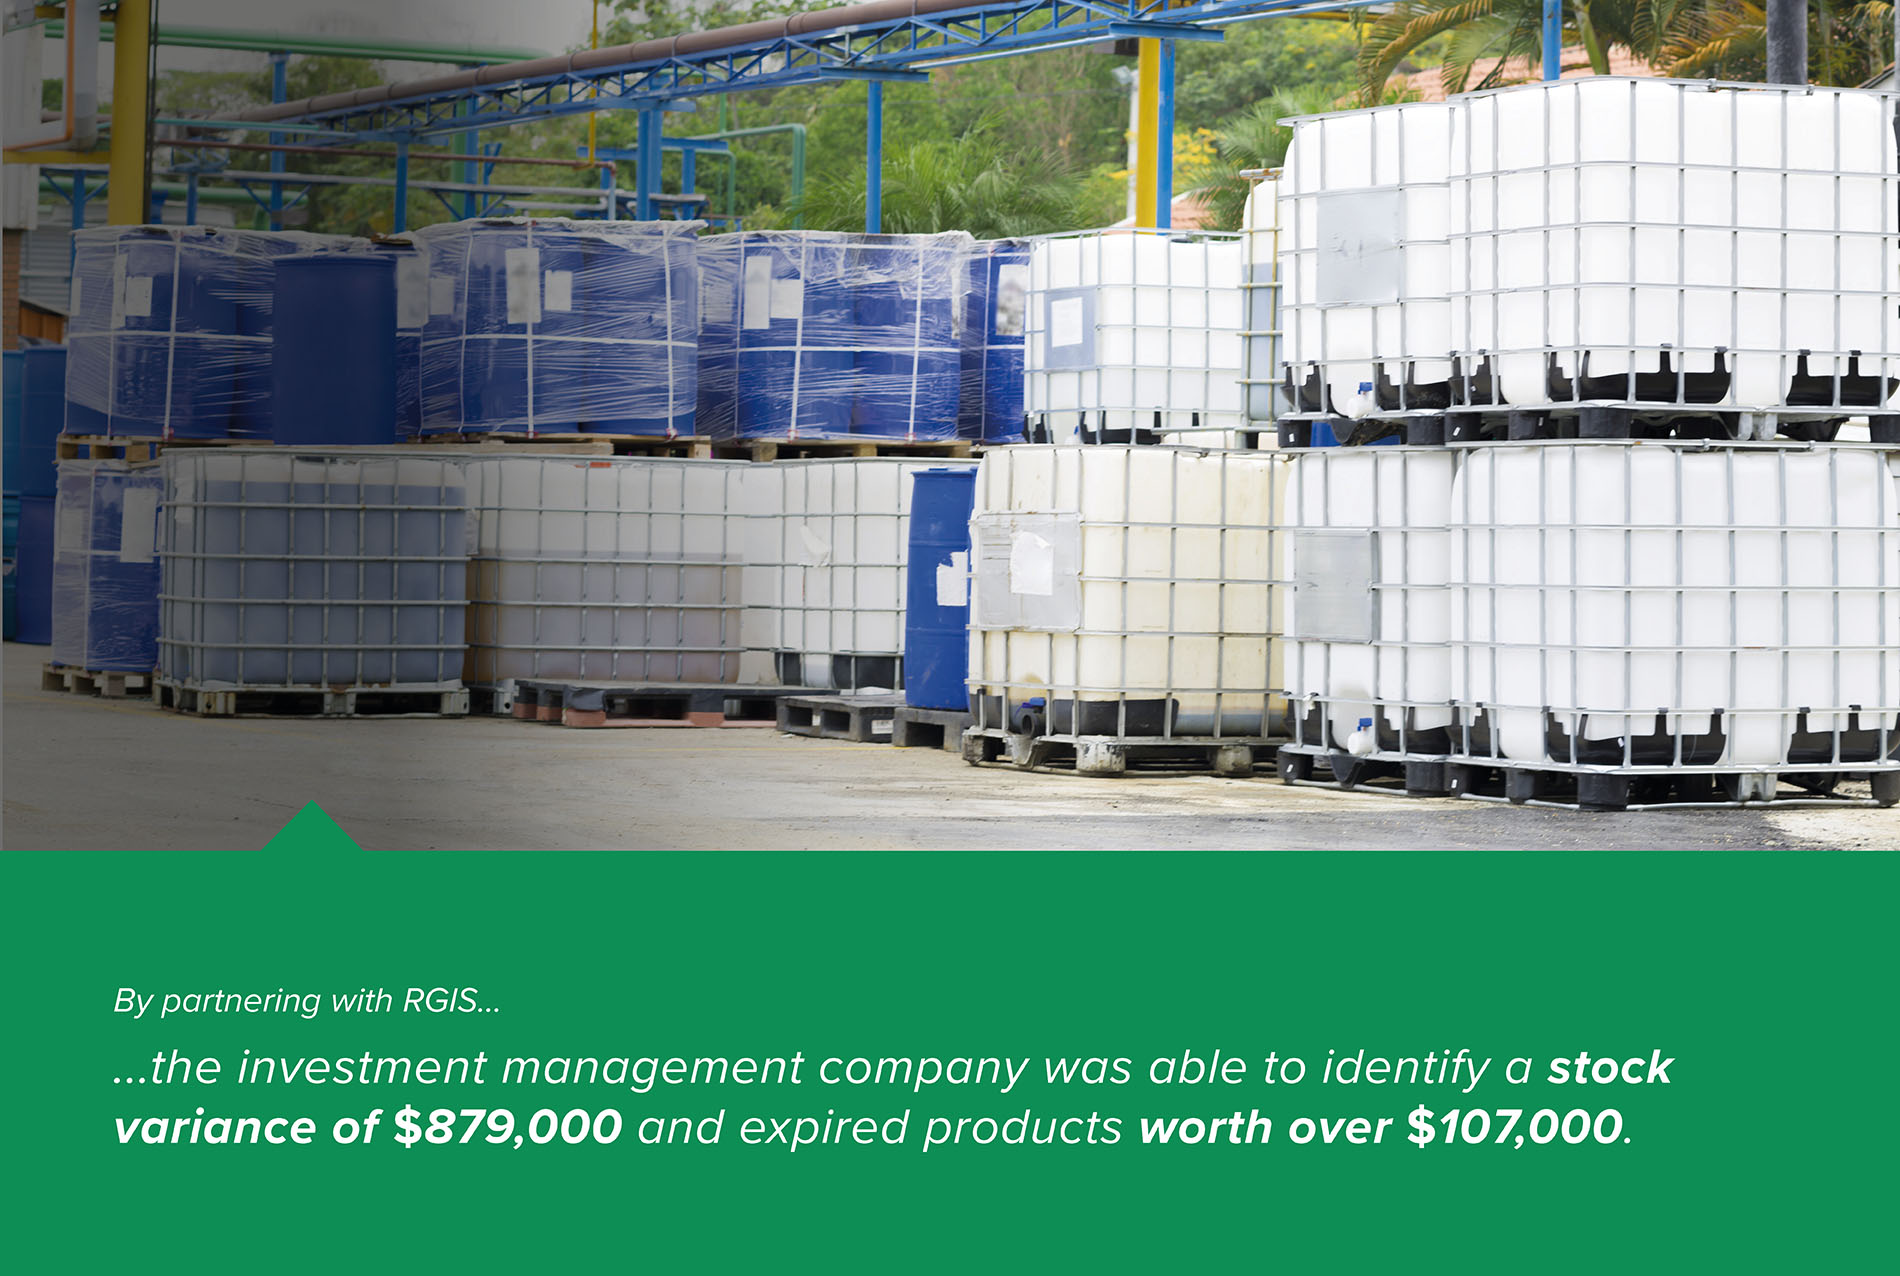 Simultaneous Acquisition Inventories of Pesticides